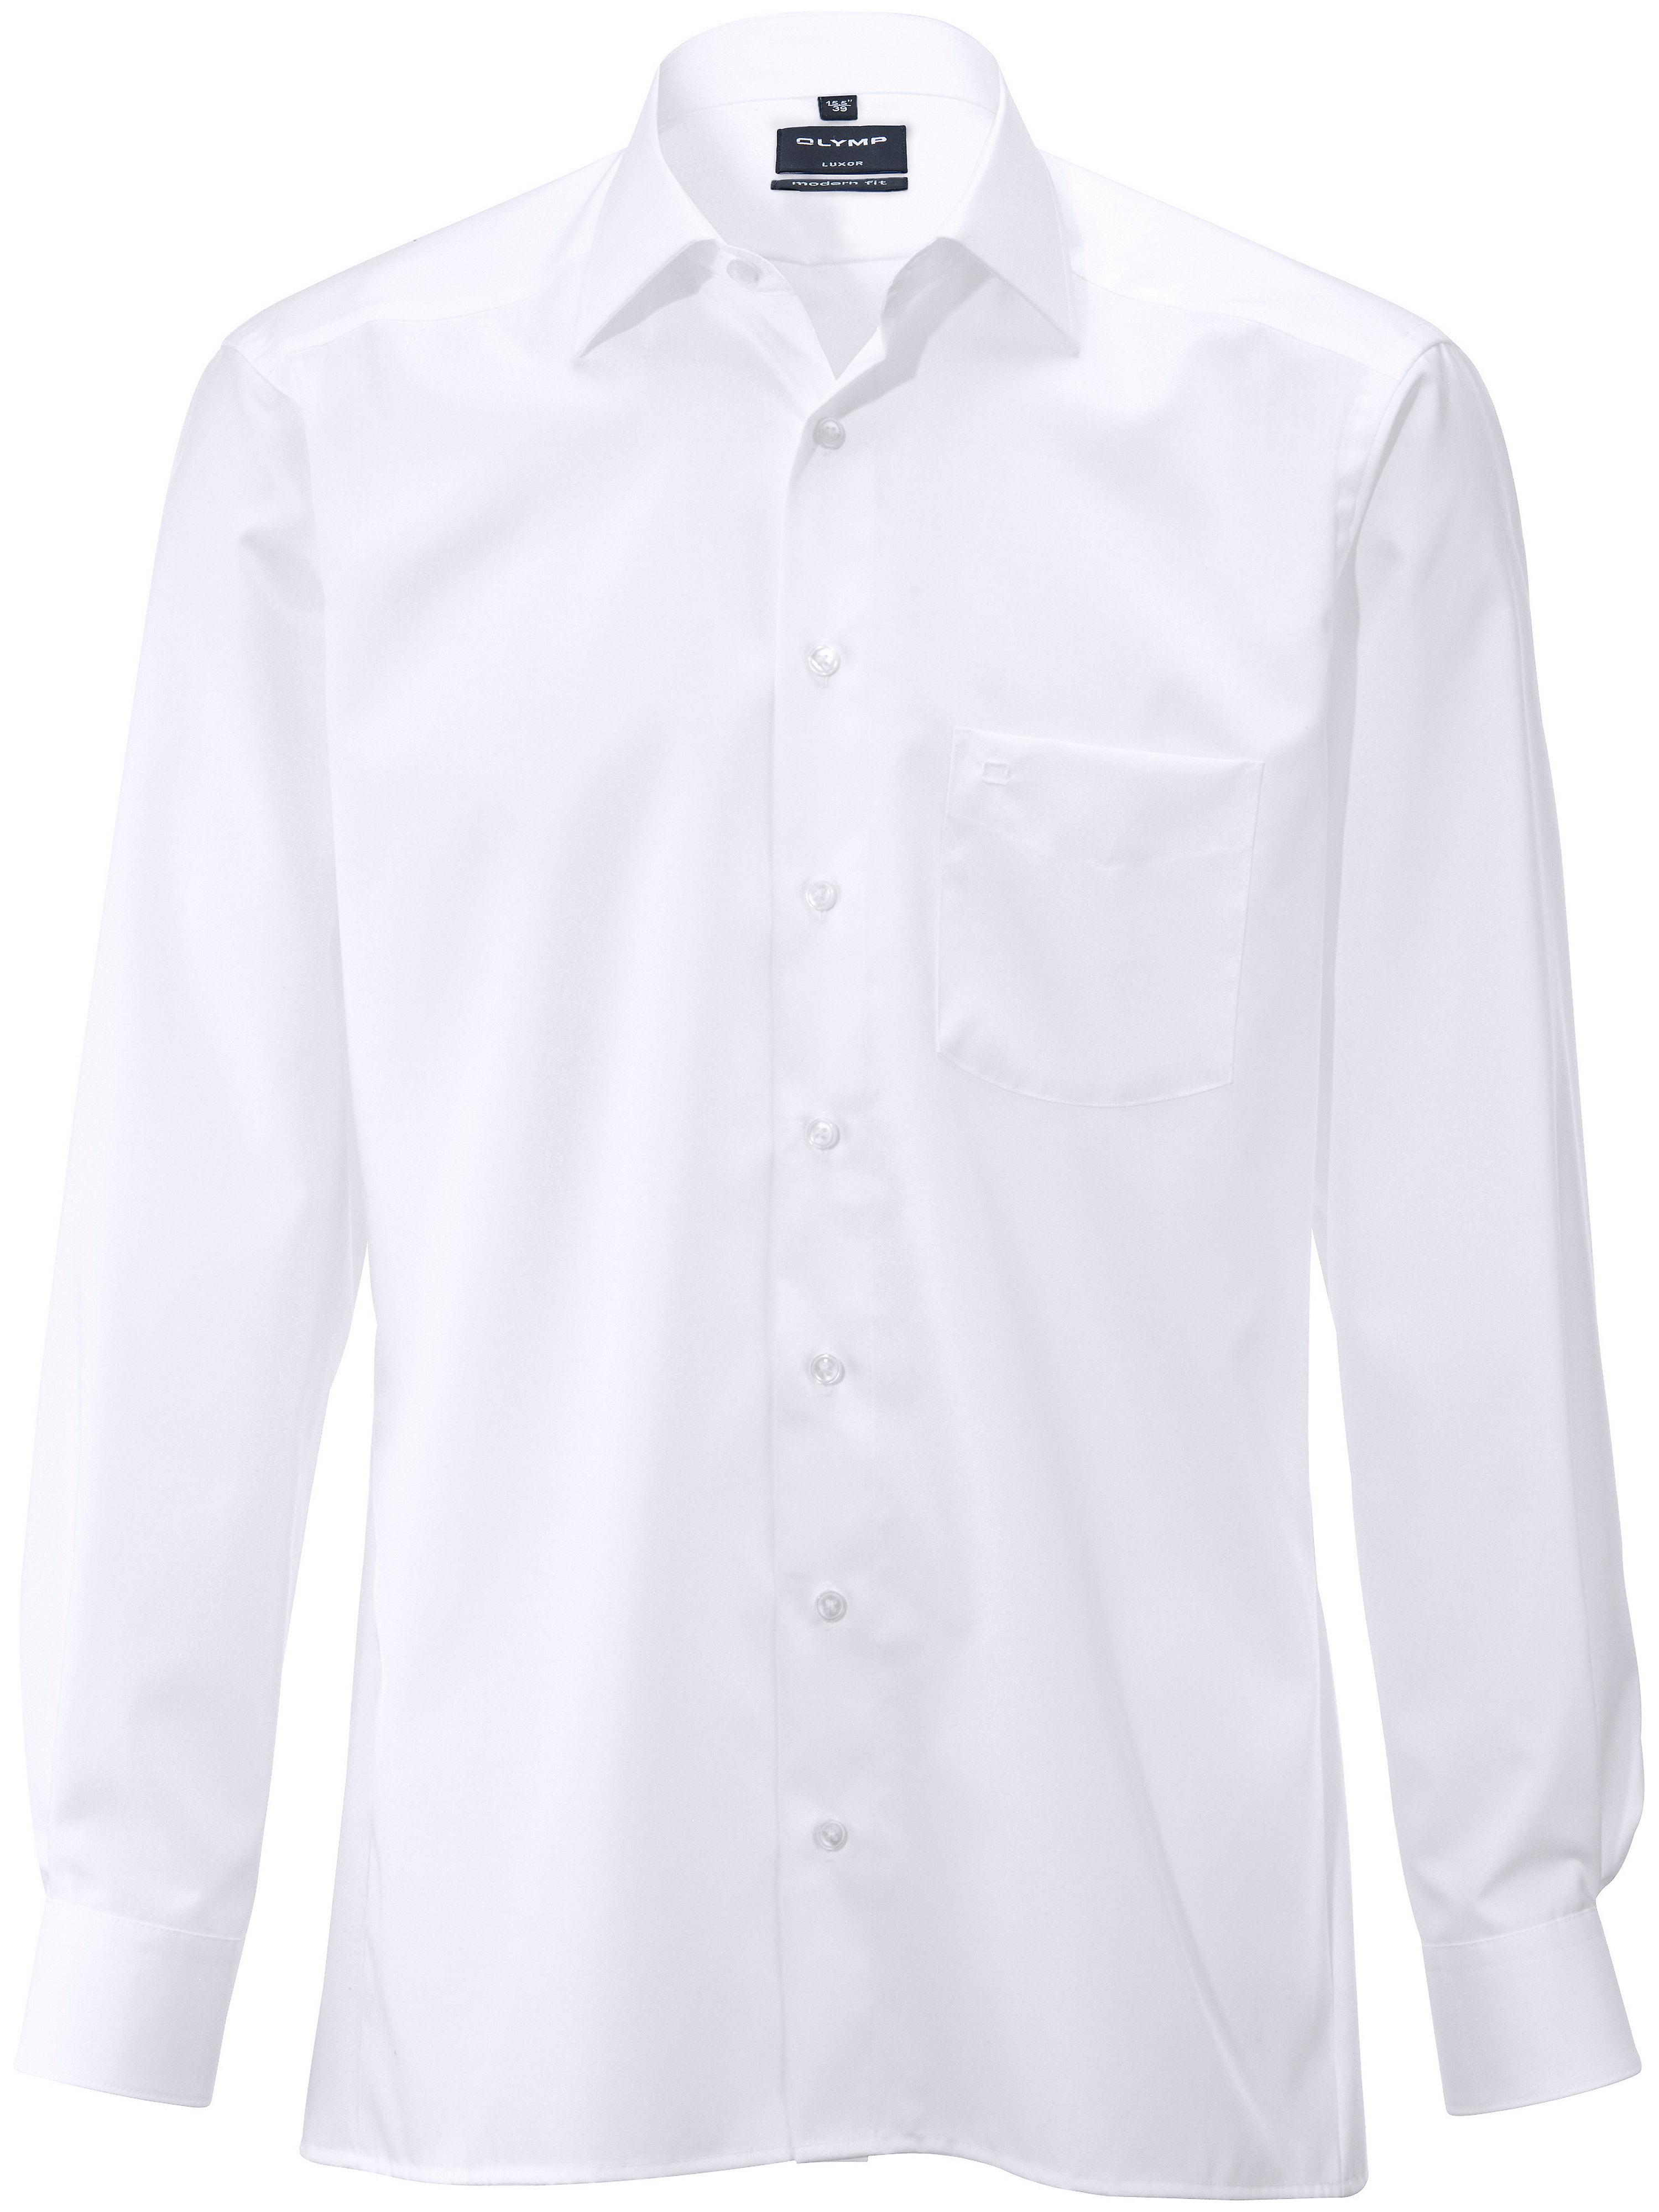 La chemise  Olymp Luxor blanc